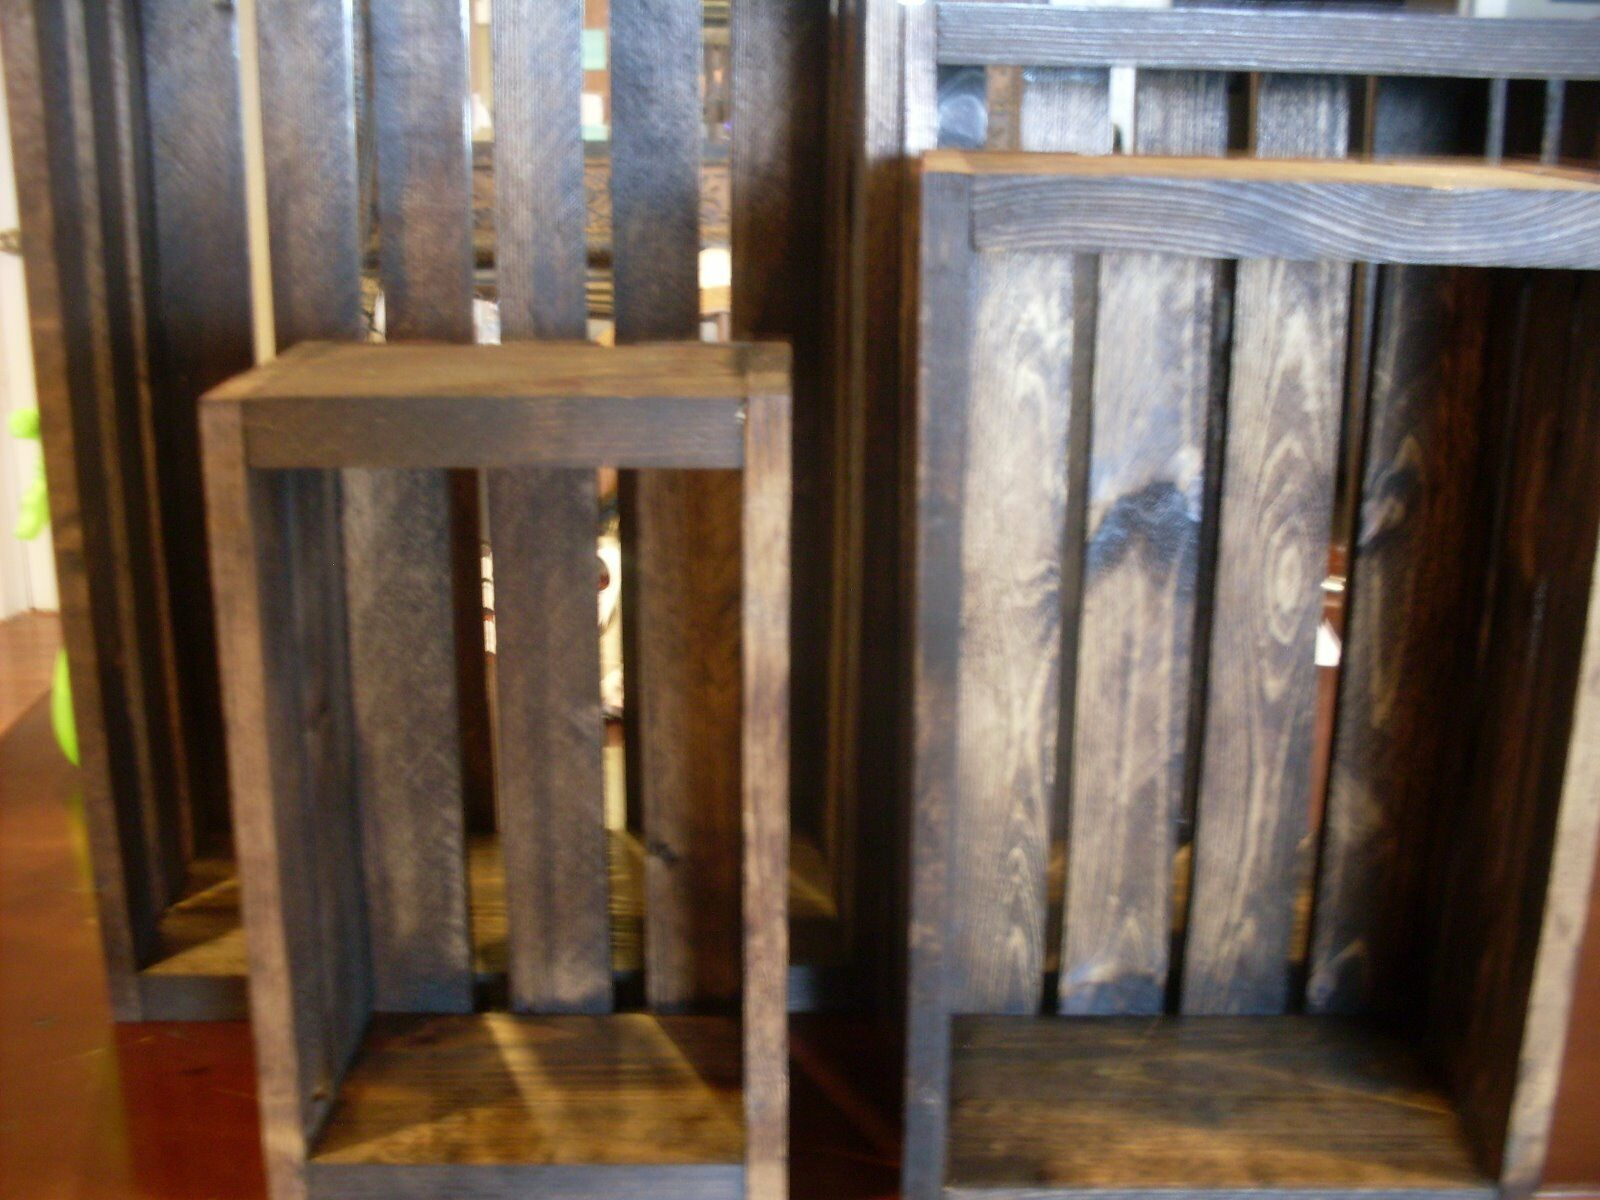 Купить Rustic Wood Crates New Hand Crafted Set of 4